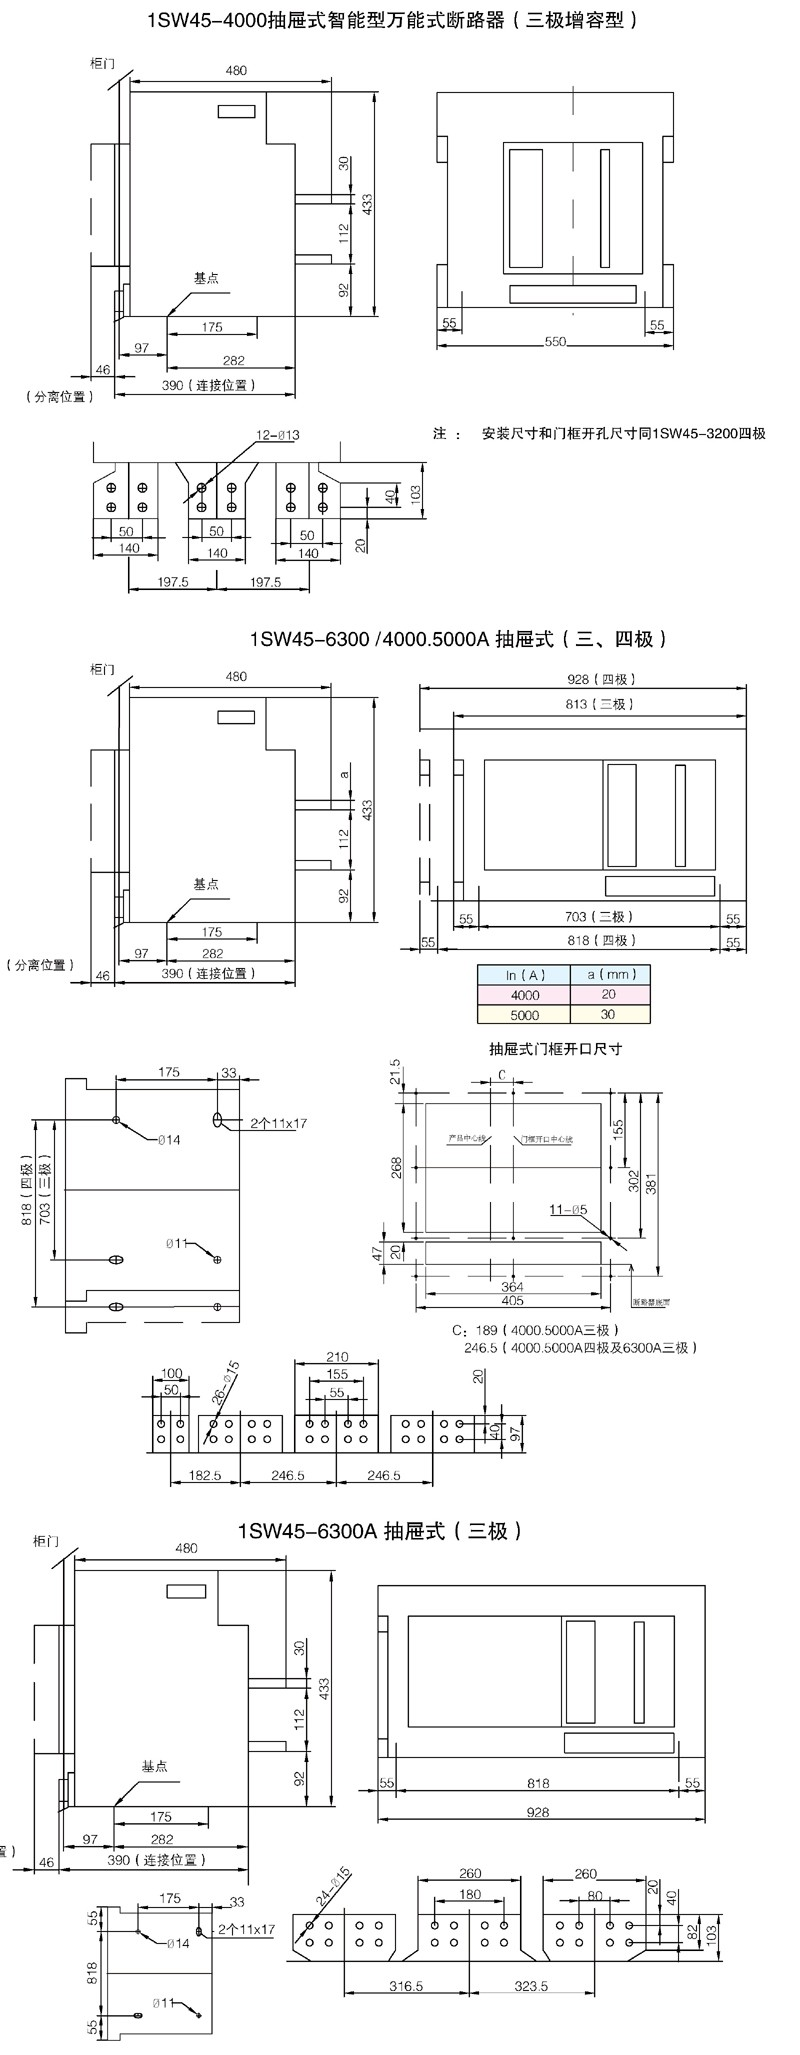 6300A外形与安装尺寸.jpg